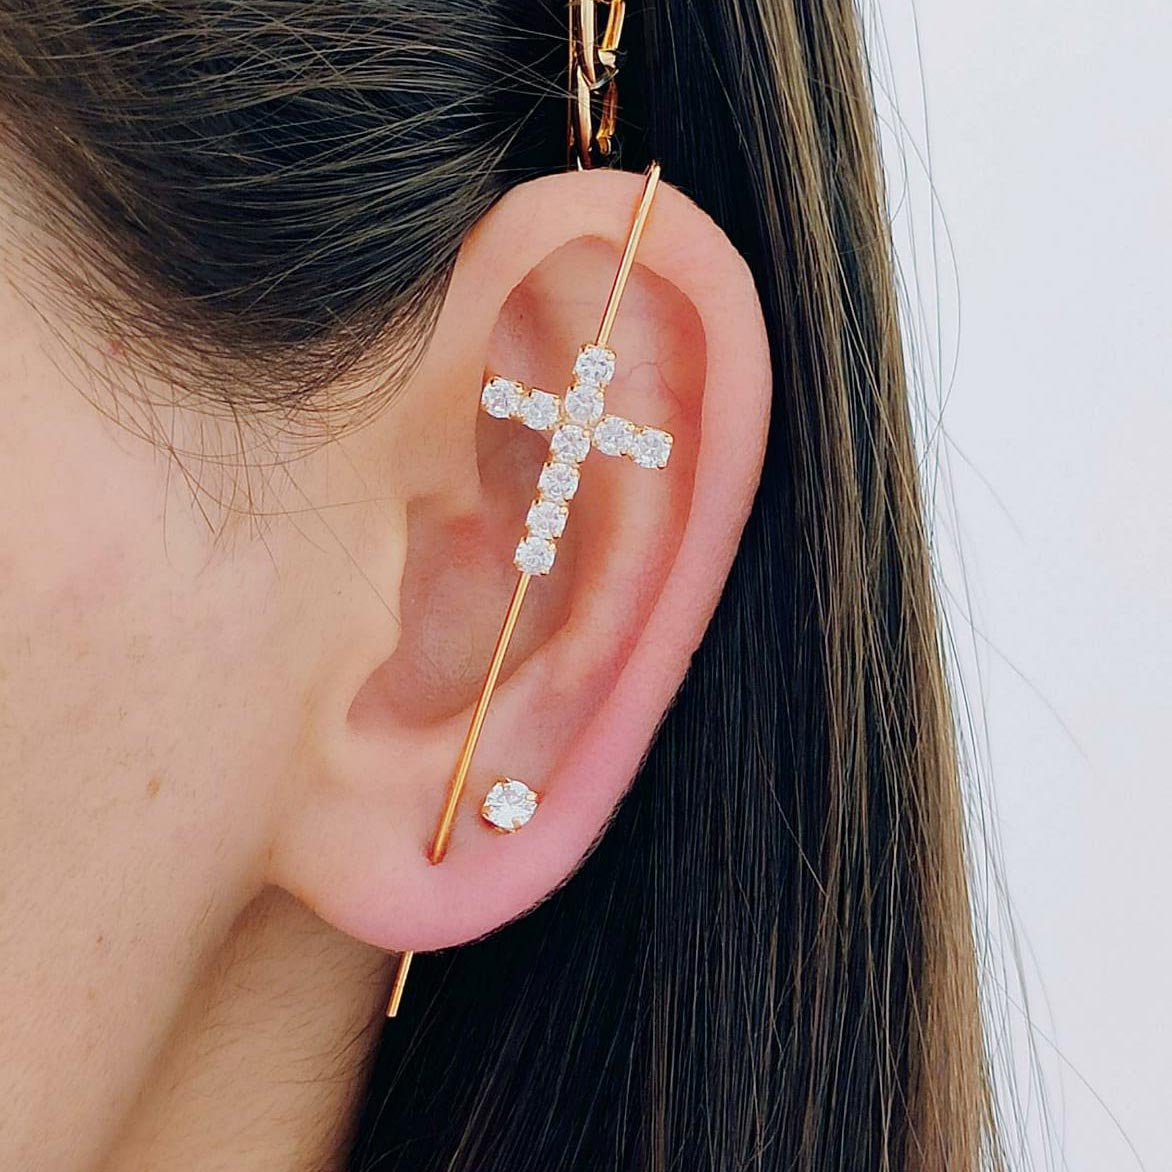 Brinco Ear Cuff de Cruz